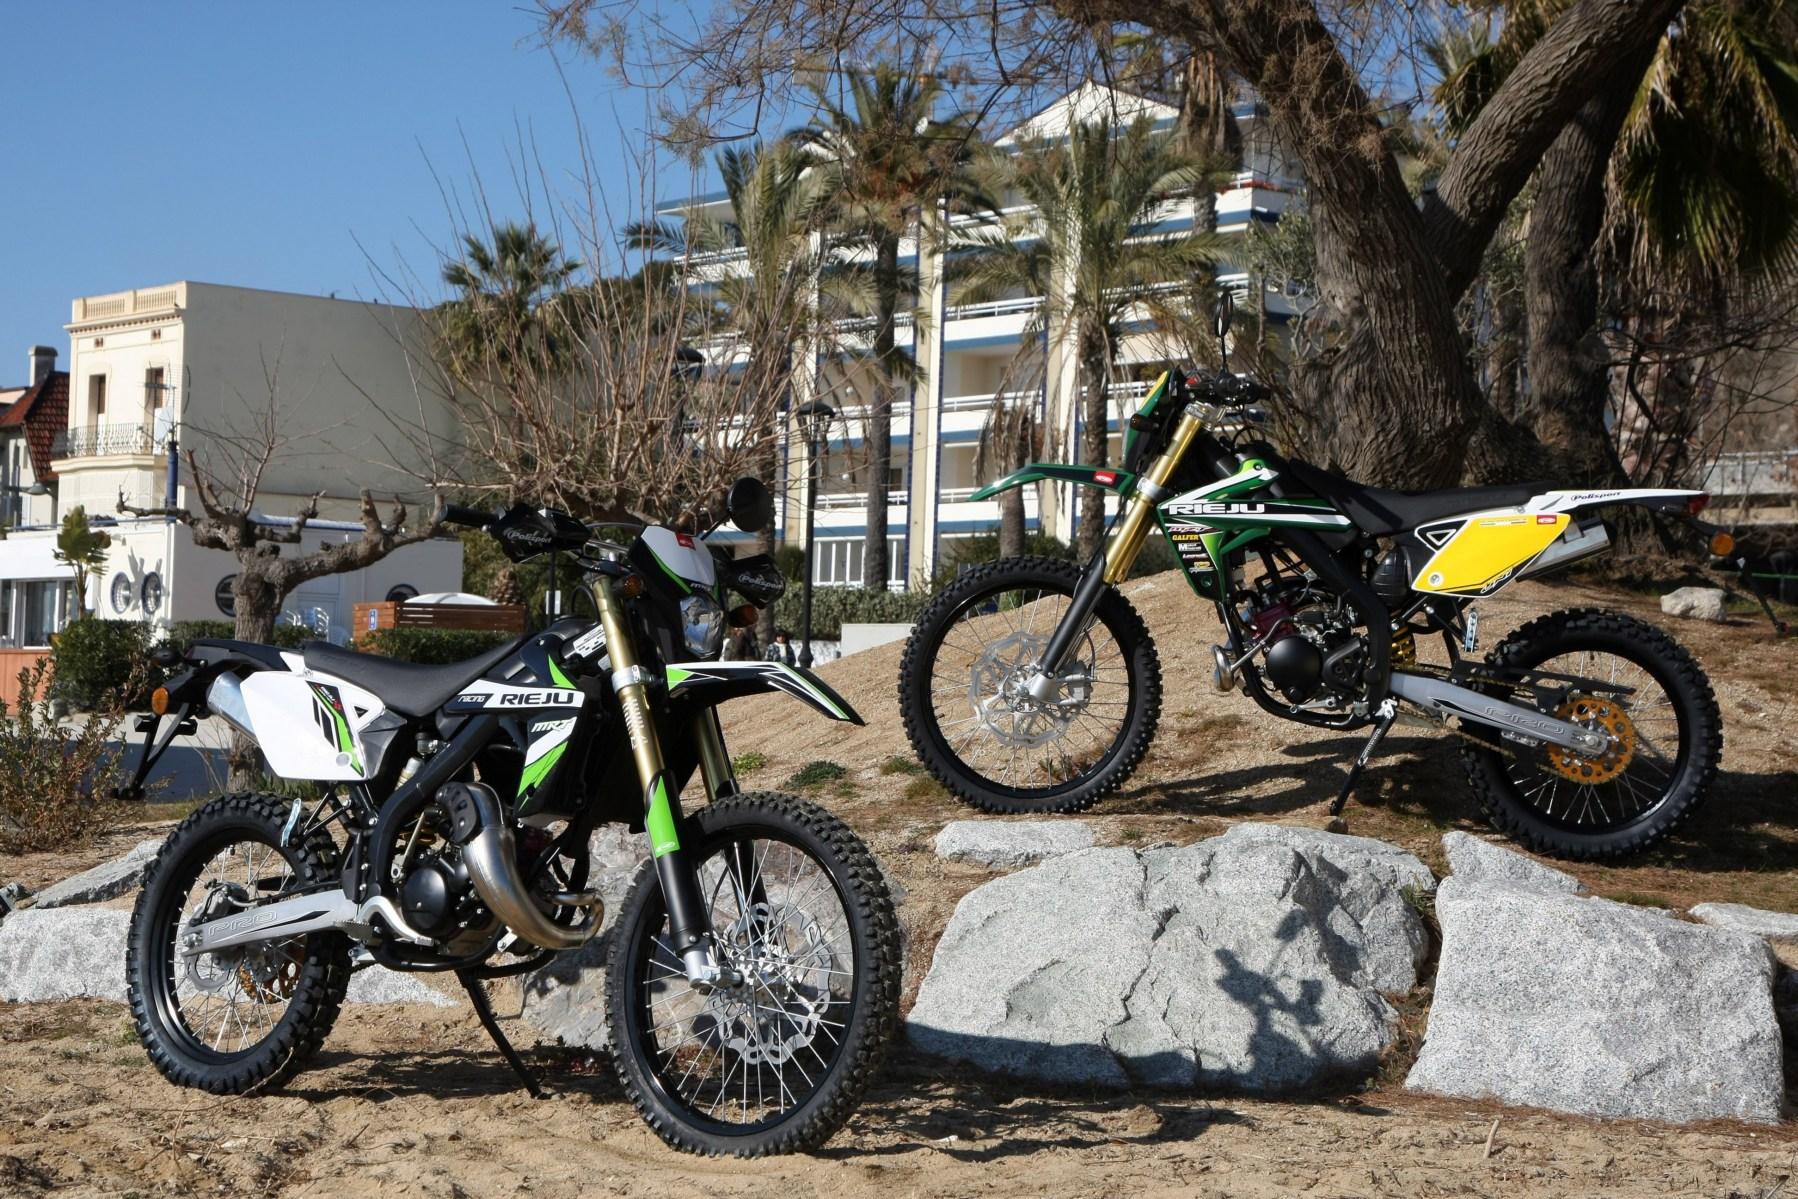 2013 rieju mrt 50 pro the diminutive motocross machine. Black Bedroom Furniture Sets. Home Design Ideas